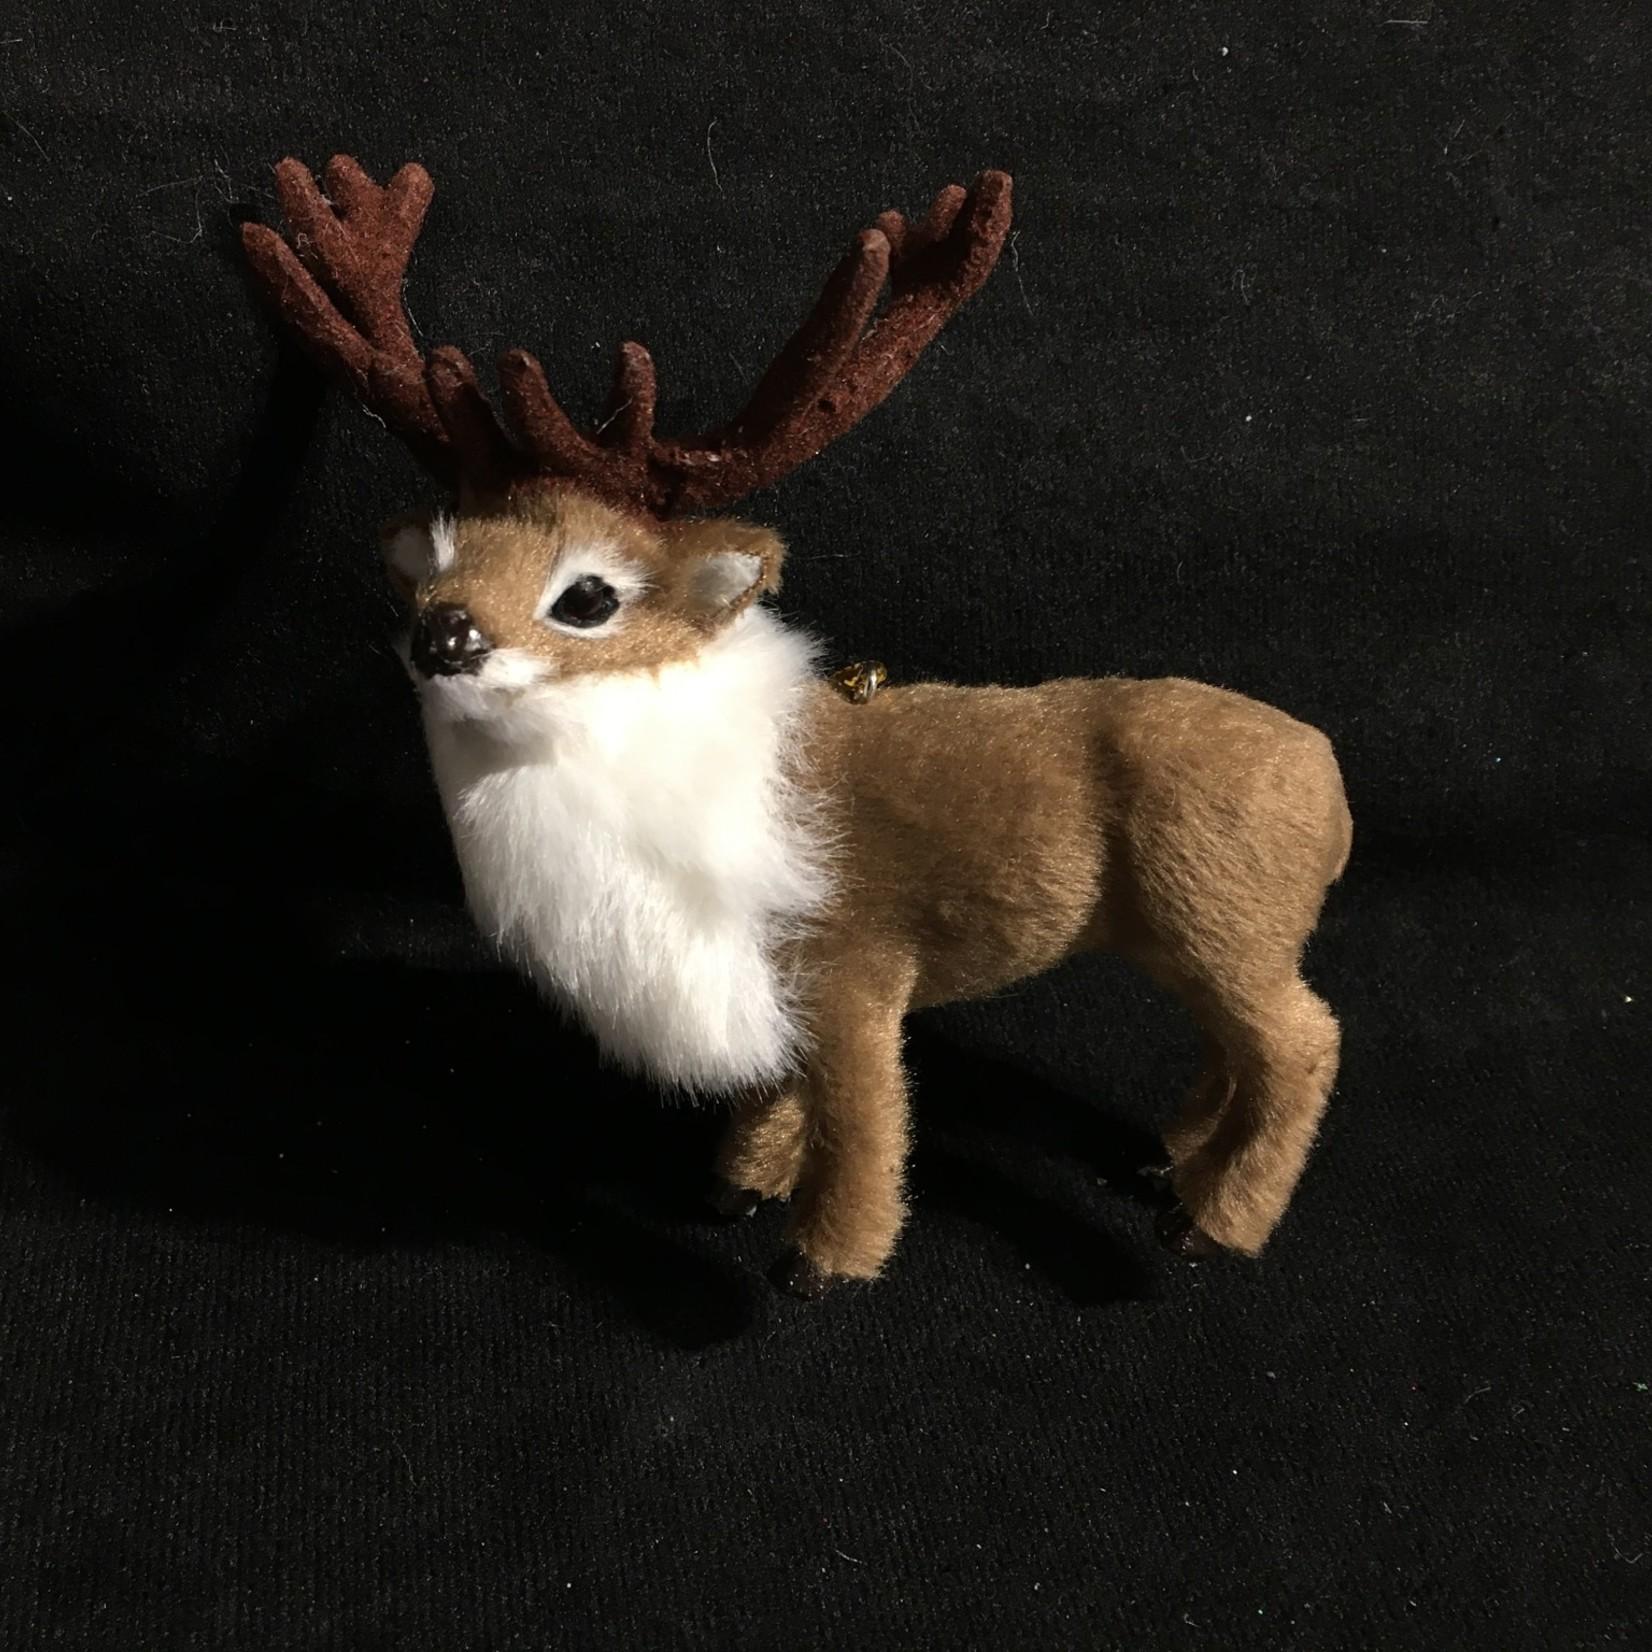 **Furry Reindeer Ornament